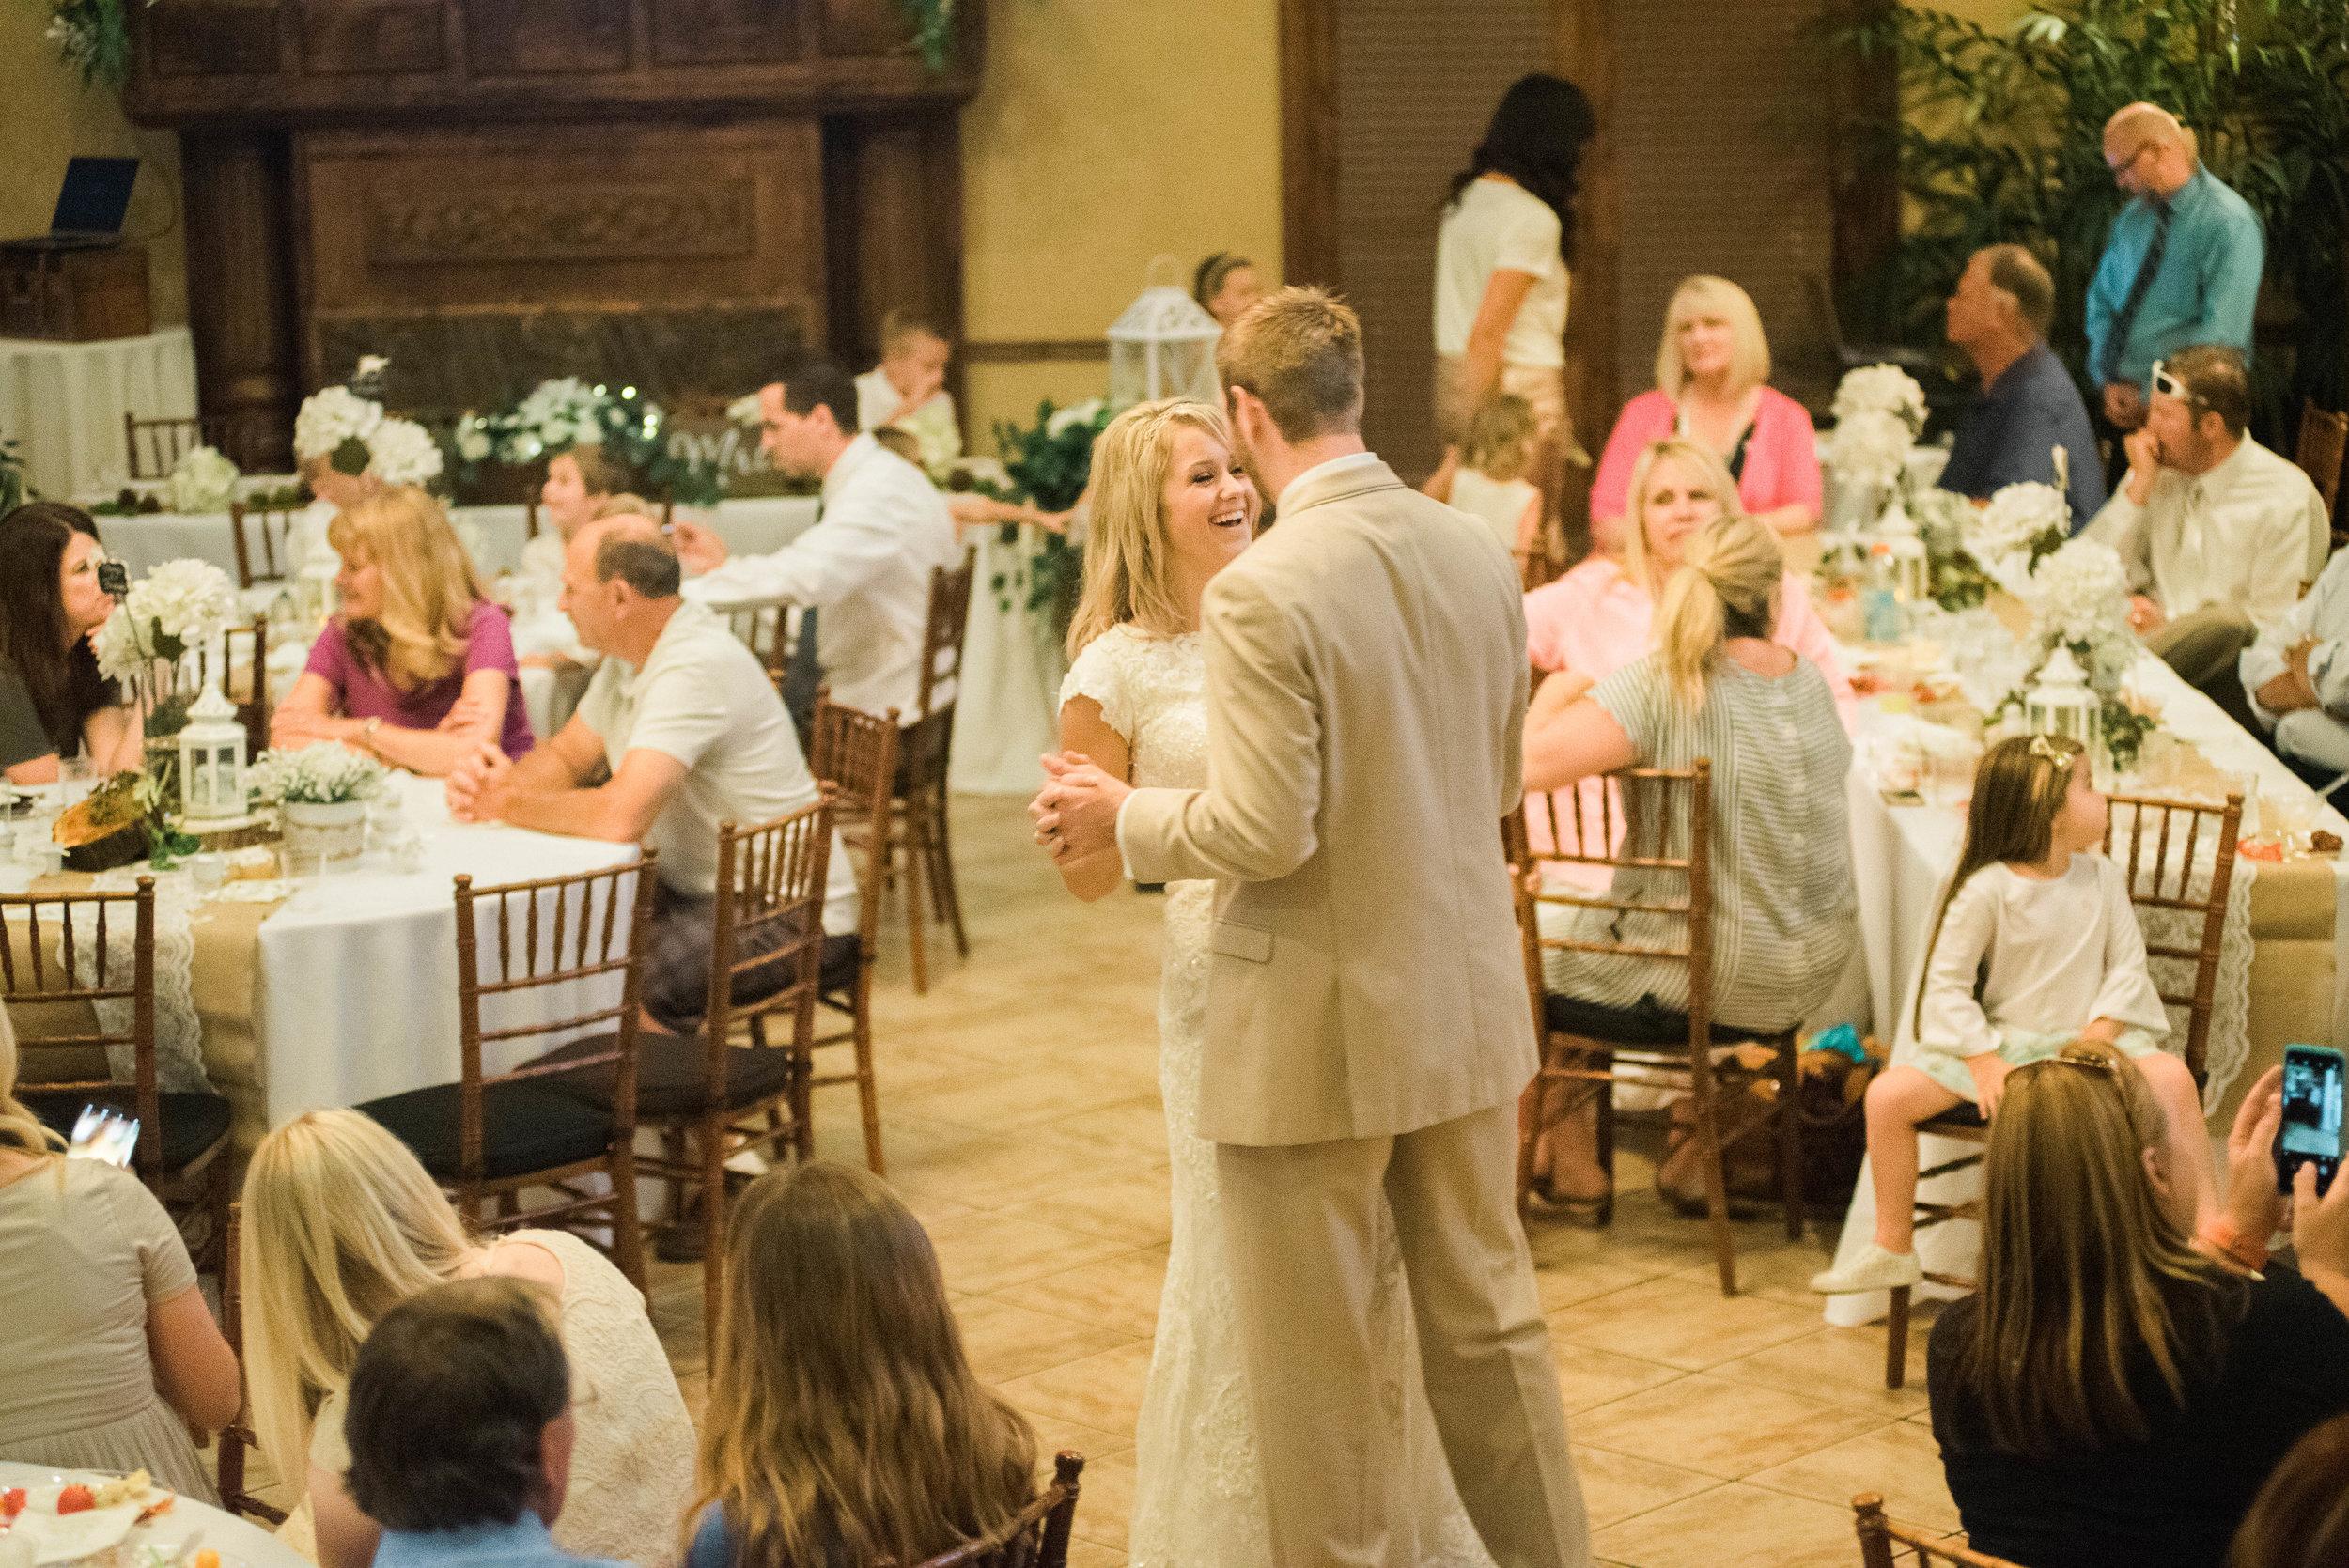 DANIEL+LACI-WEDDING-Sadie_Banks_Photography-577.jpg